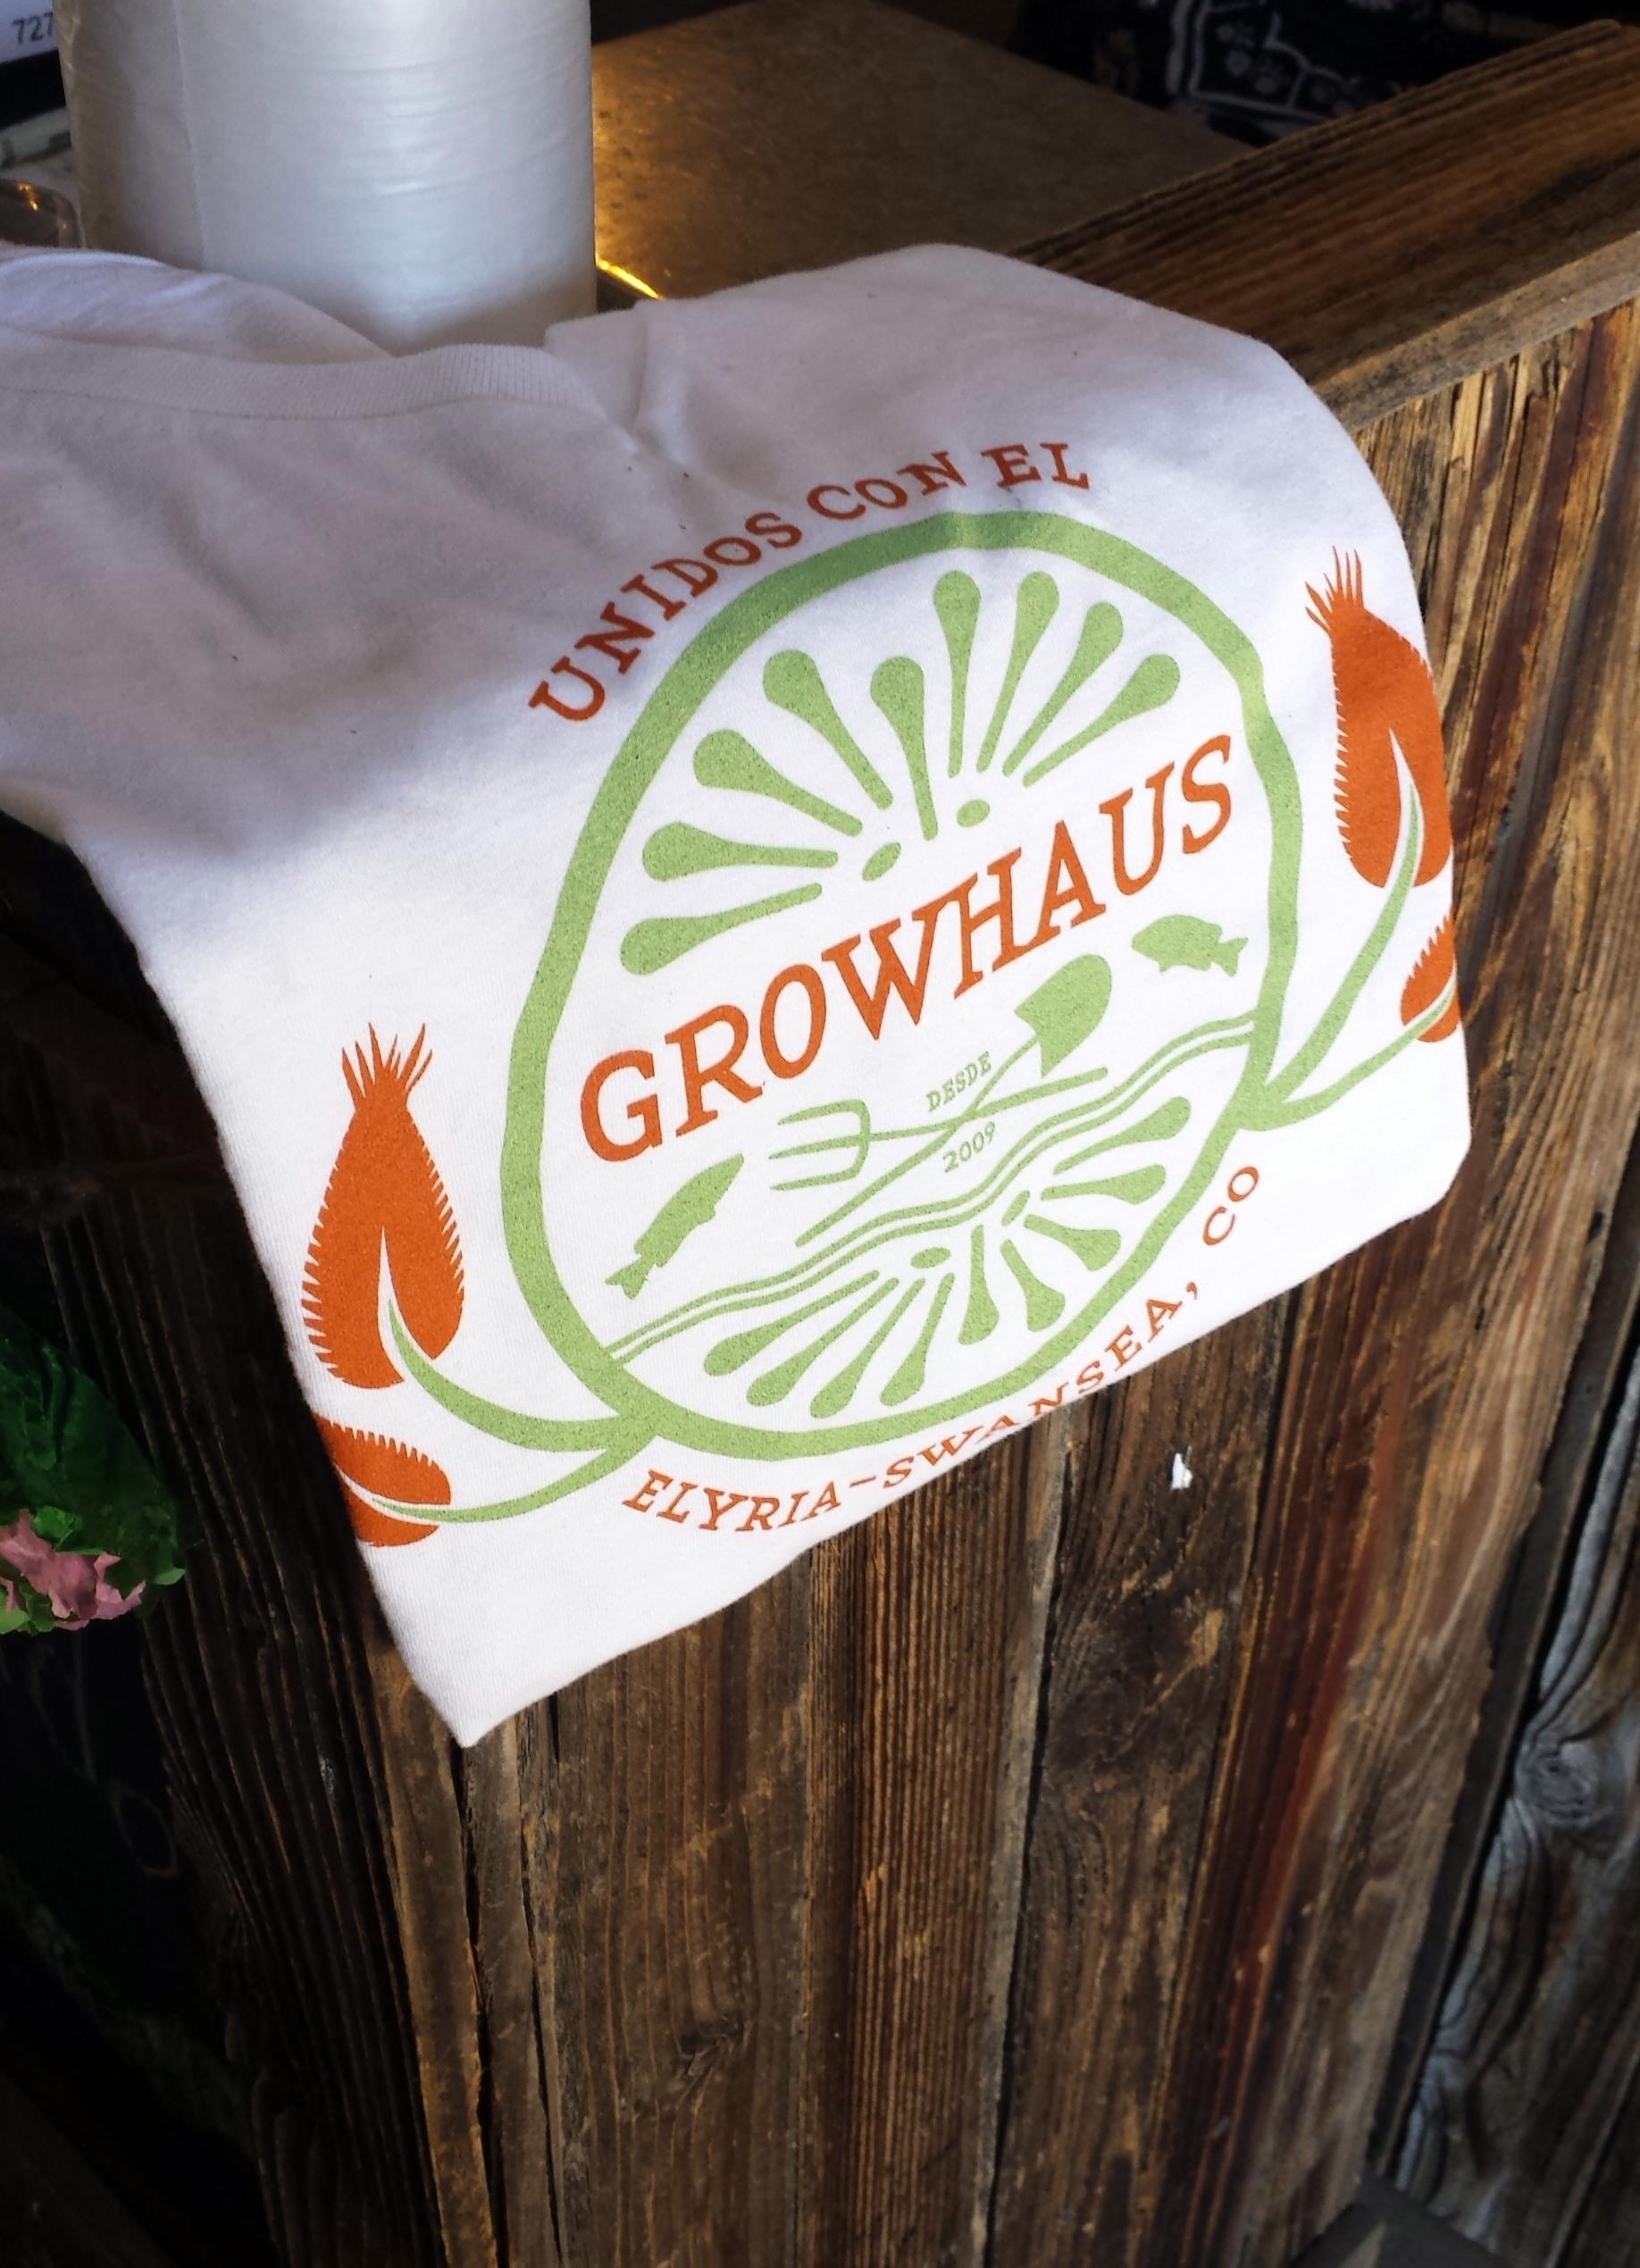 The GrowHaus, an urban greenhouse in Denver